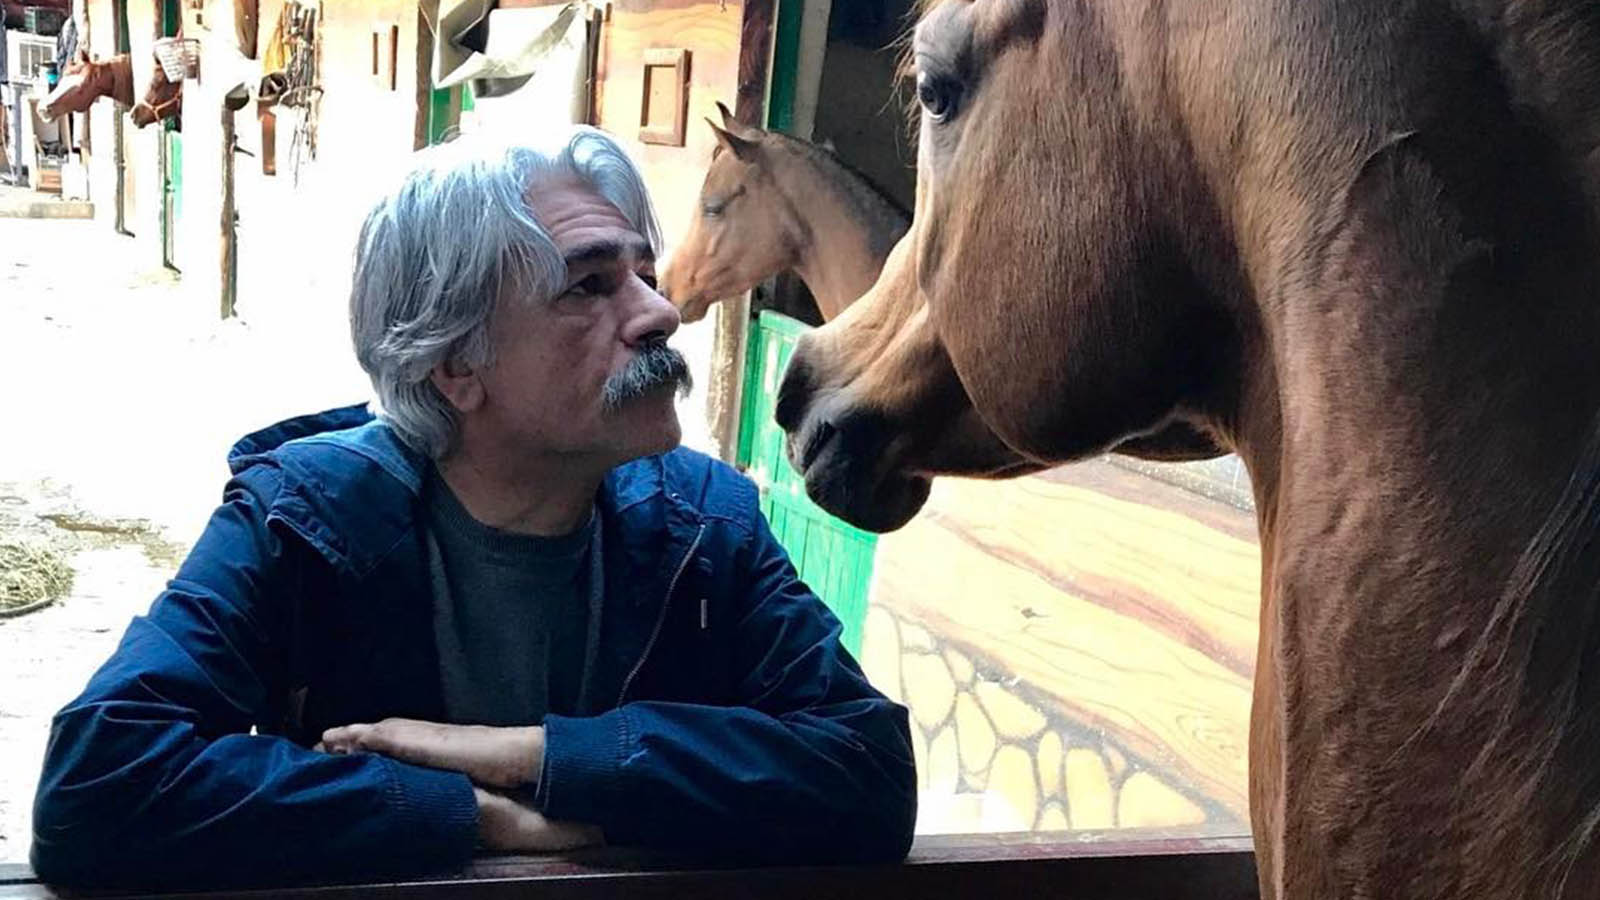 علم و ثروت کیهان کلهر اسب